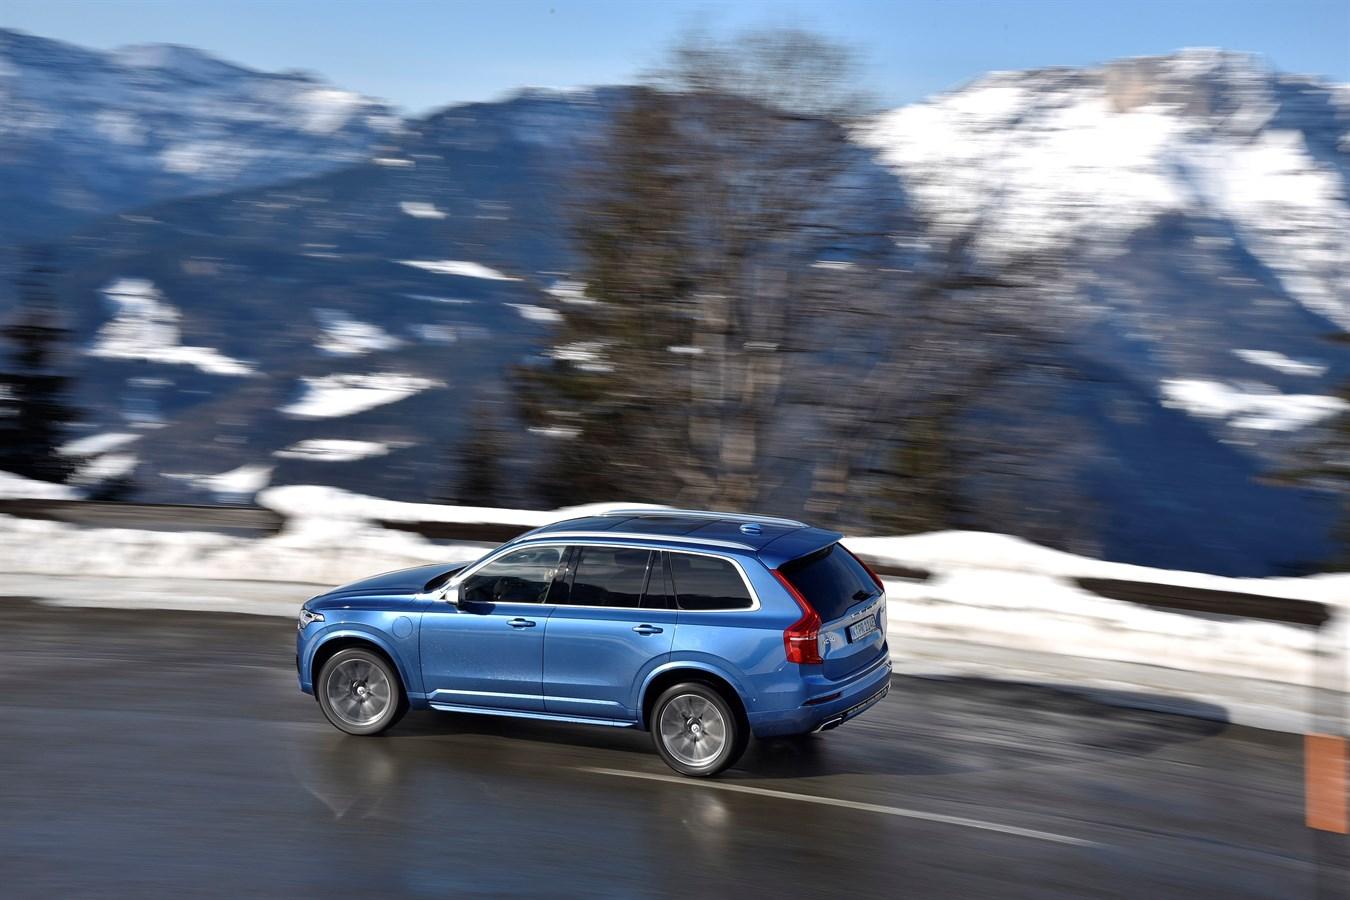 Volvo XC90 T8 - model year 2017